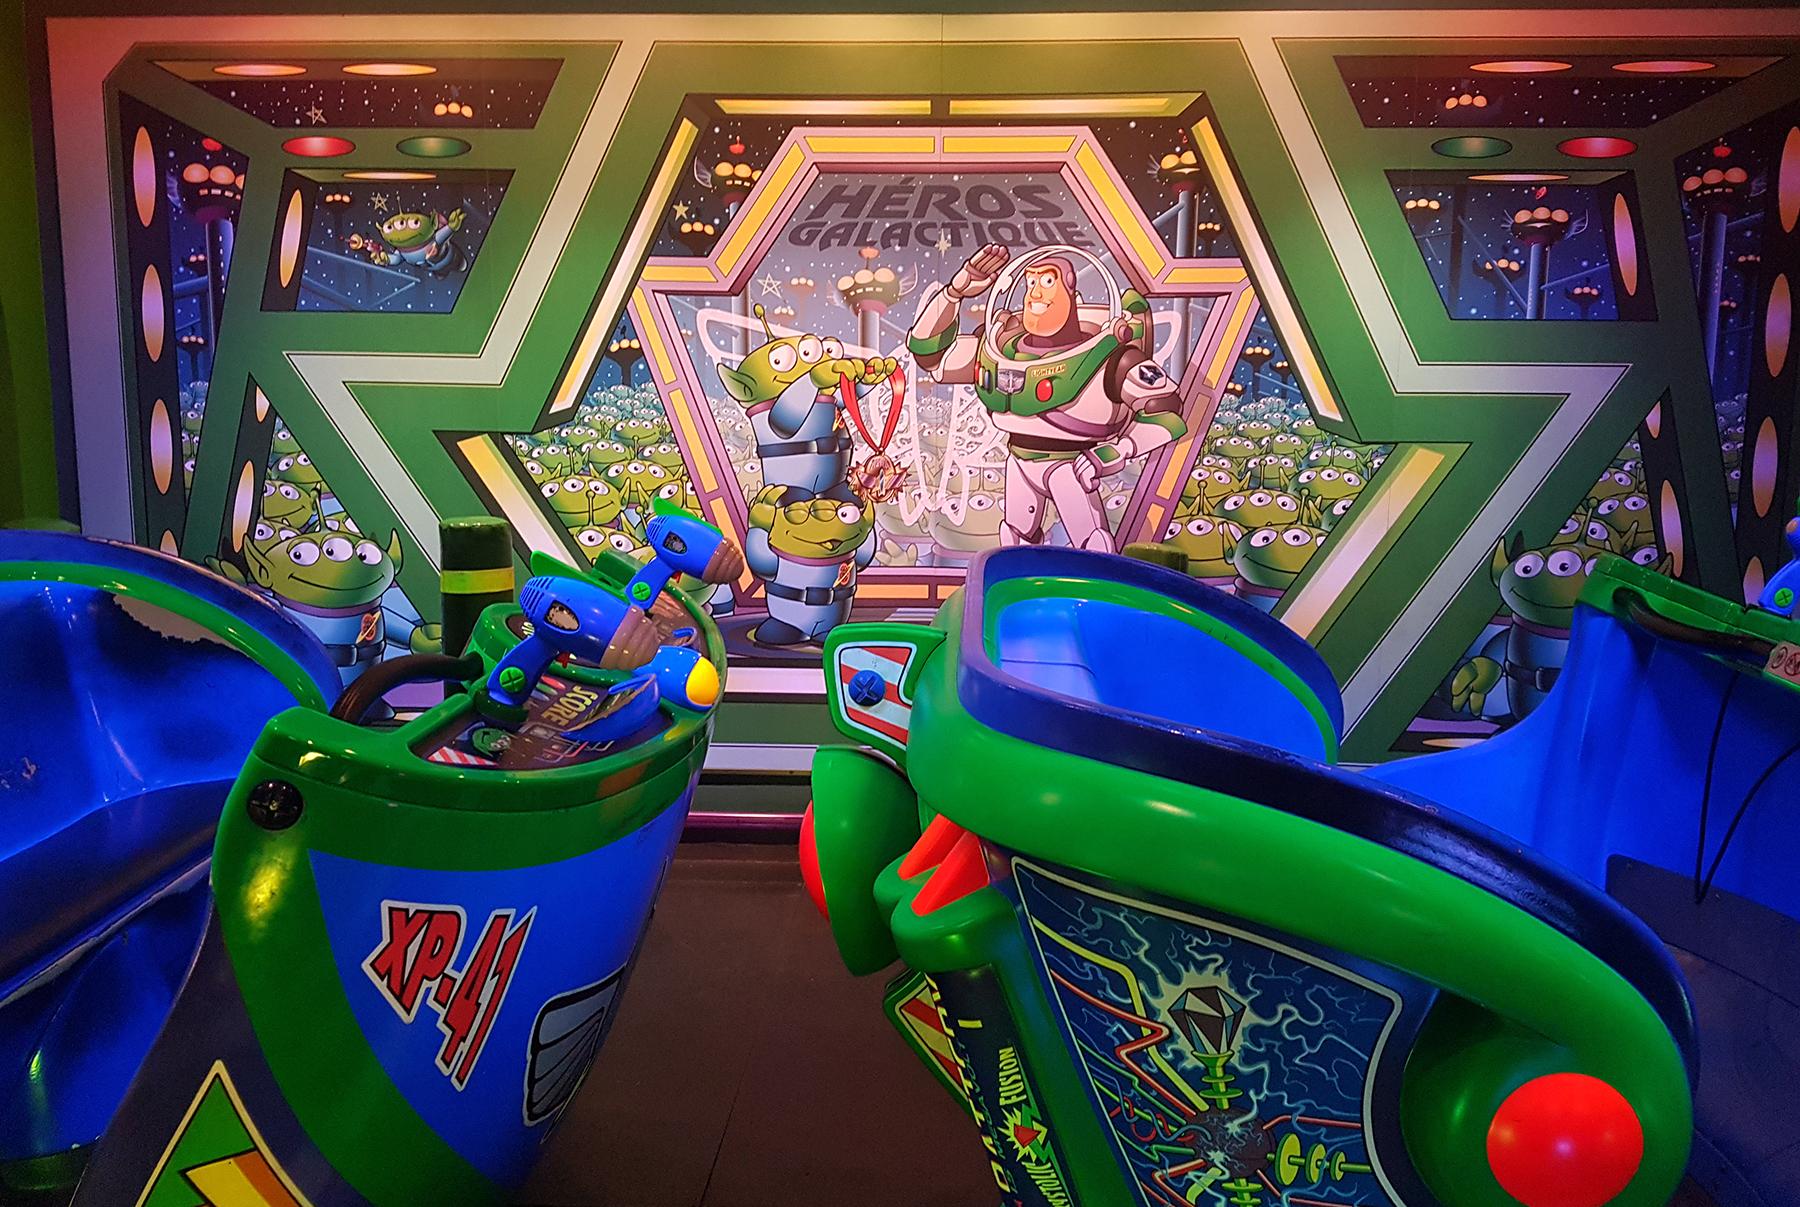 Buzz Lightyear Ride  | 9 Tips for Disneyland Paris